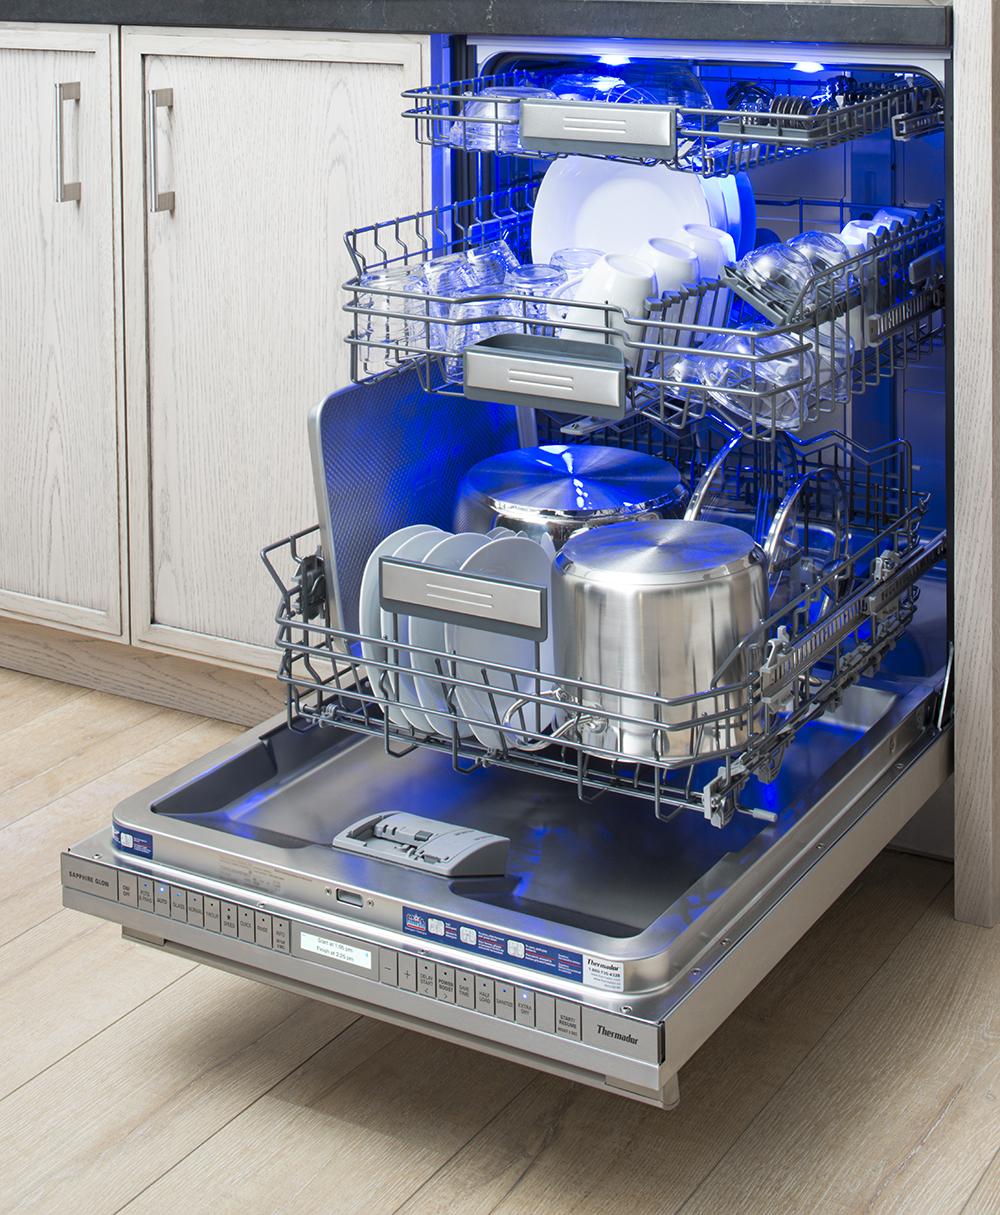 Thermador Star-Sapphire Dishwasher Mood Lighting.jpg